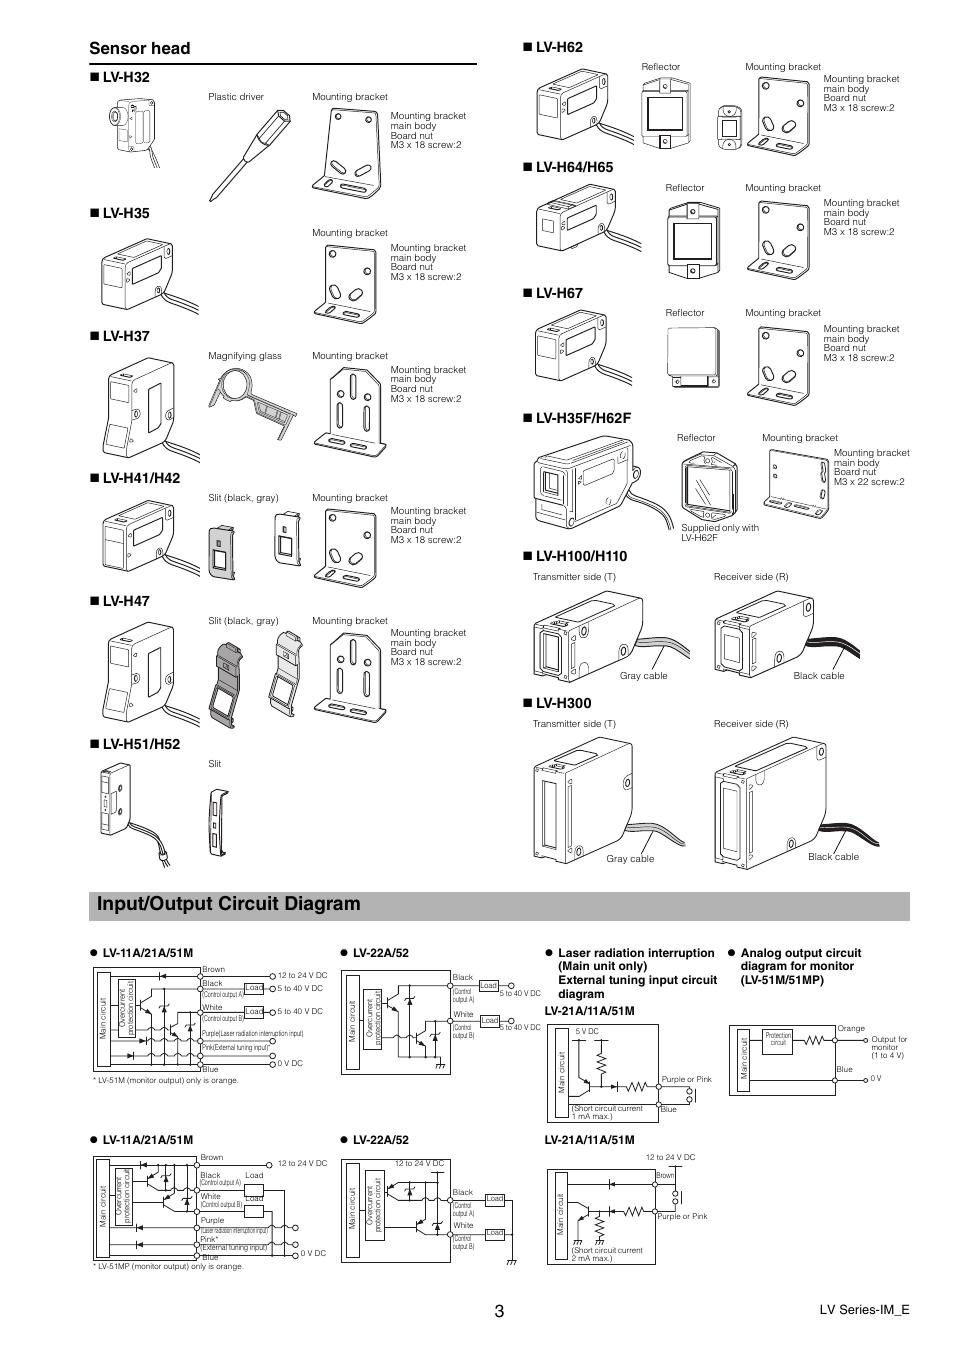 medium resolution of input output circuit diagram sensor head lv series im e keyence lv series user manual page 3 10